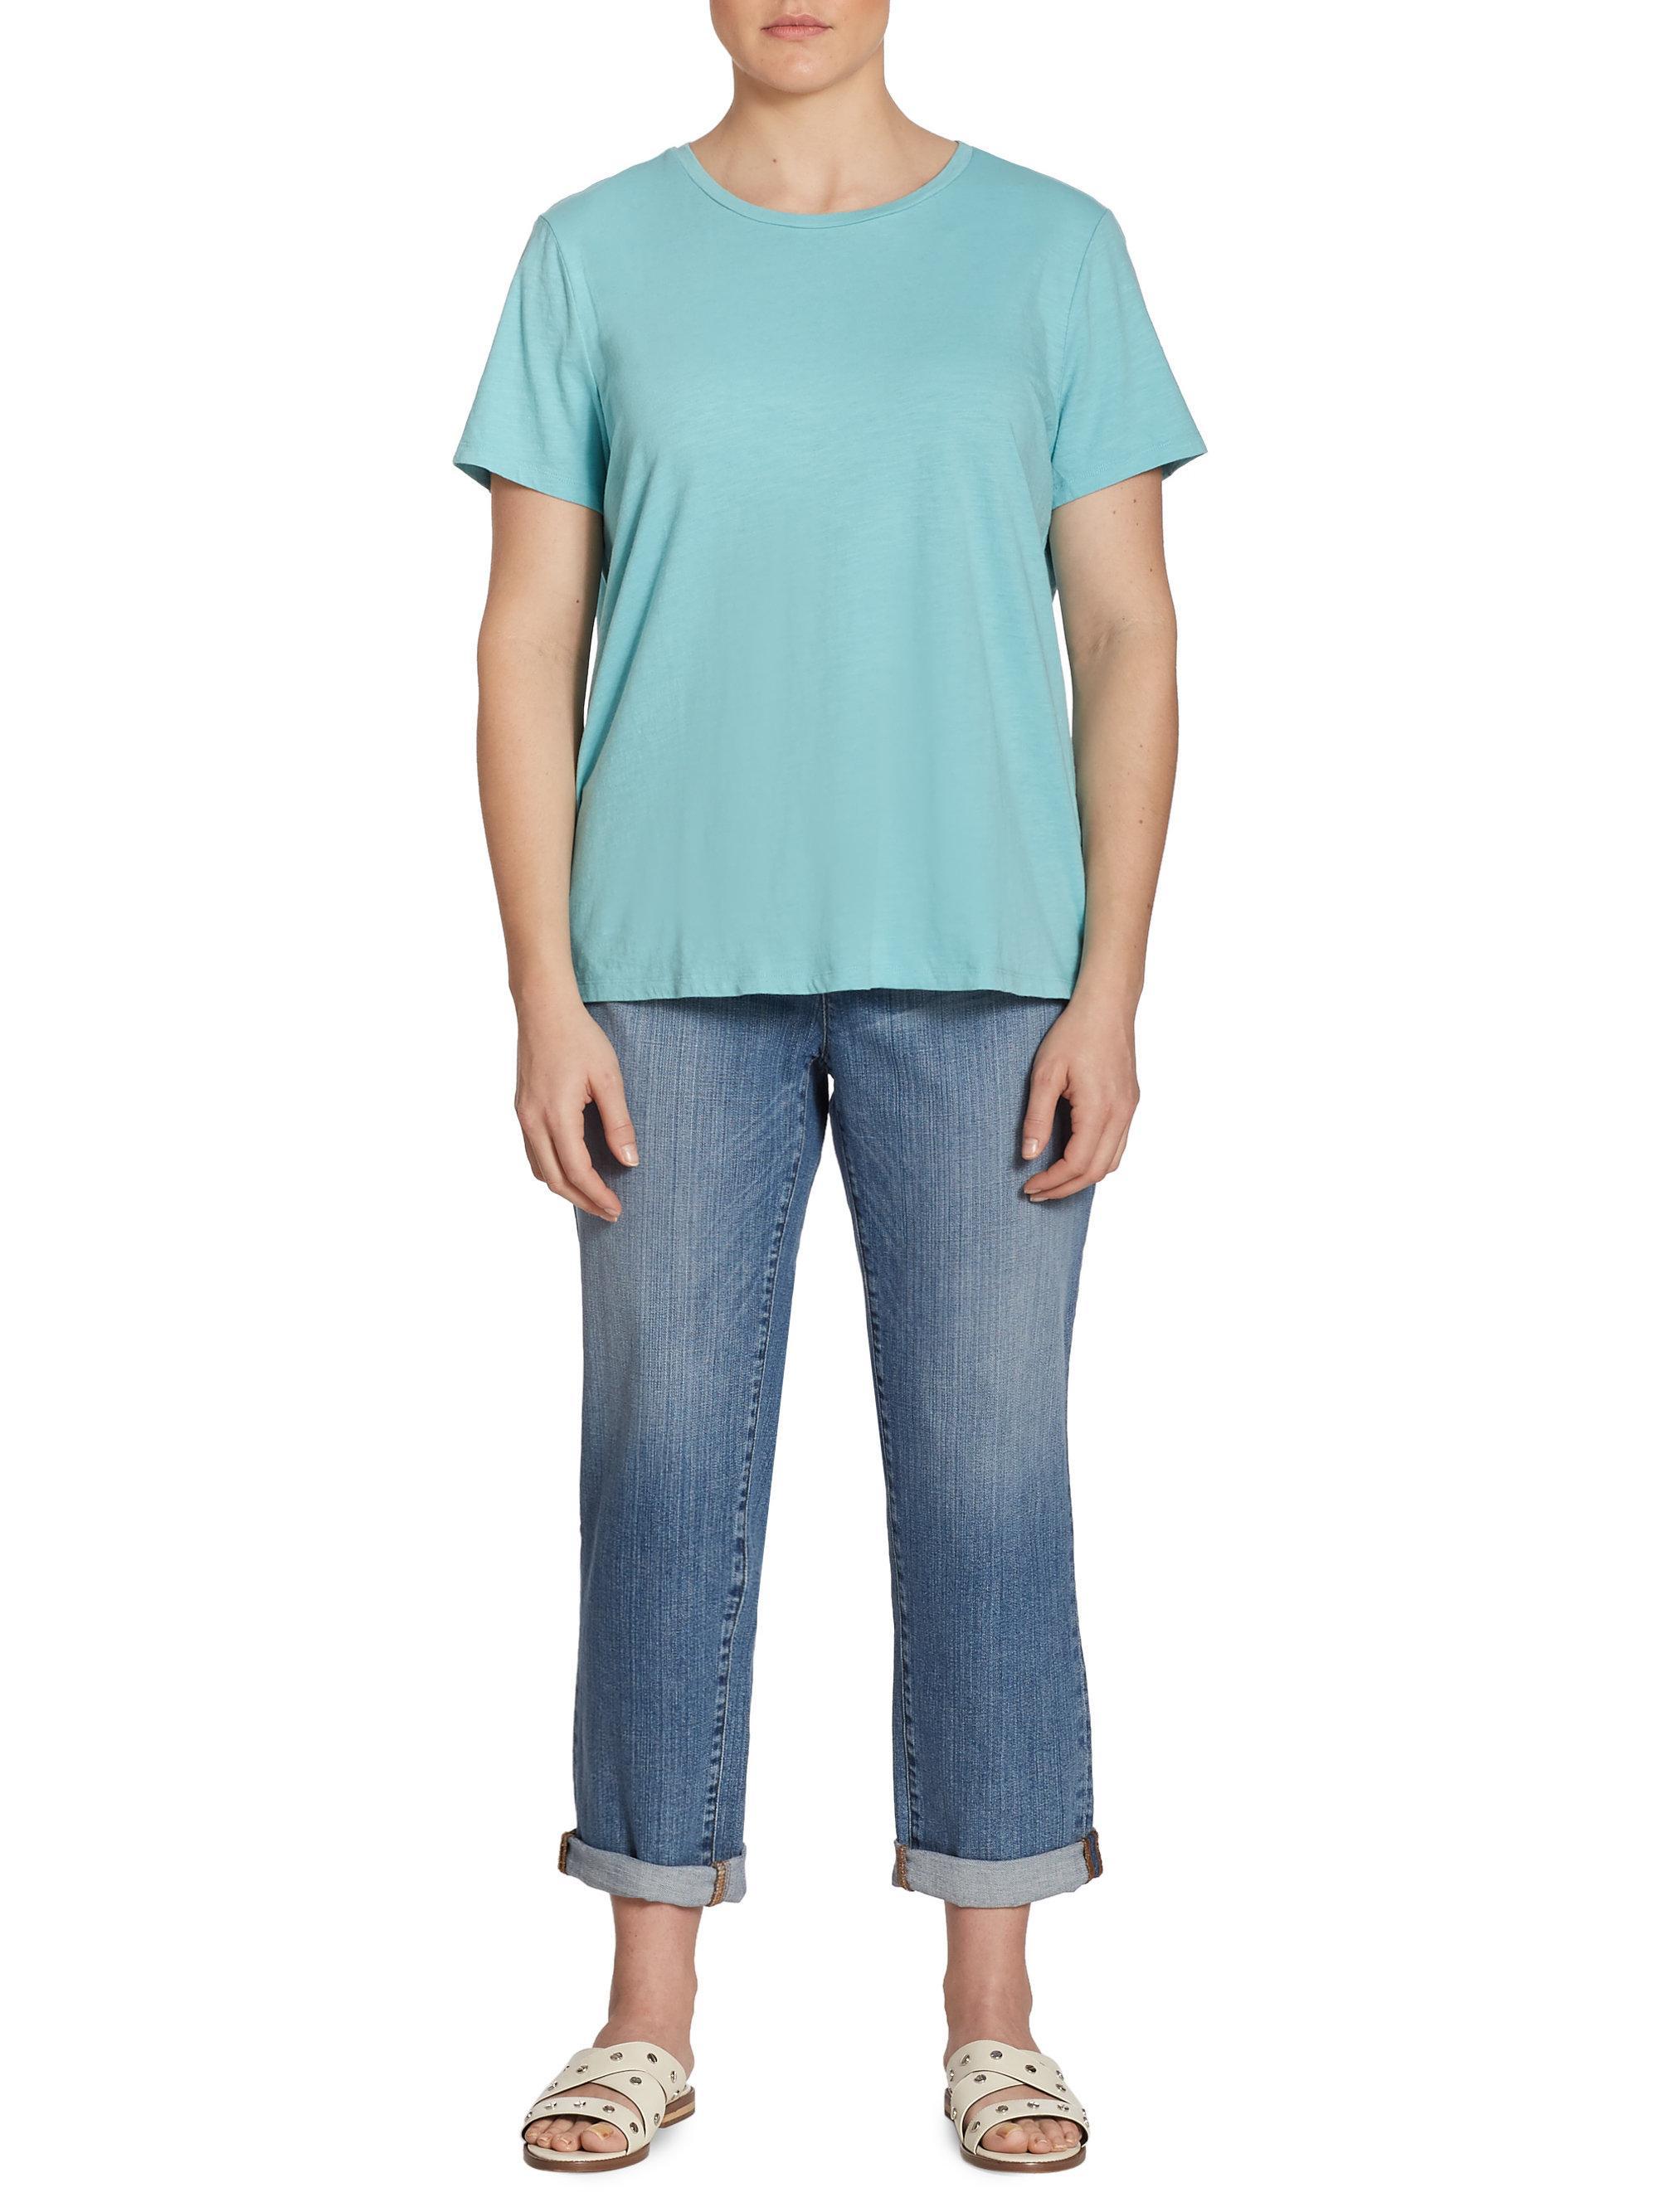 Lyst eileen fisher slub organic cotton jersey tee in blue for Eileen fisher organic cotton t shirt